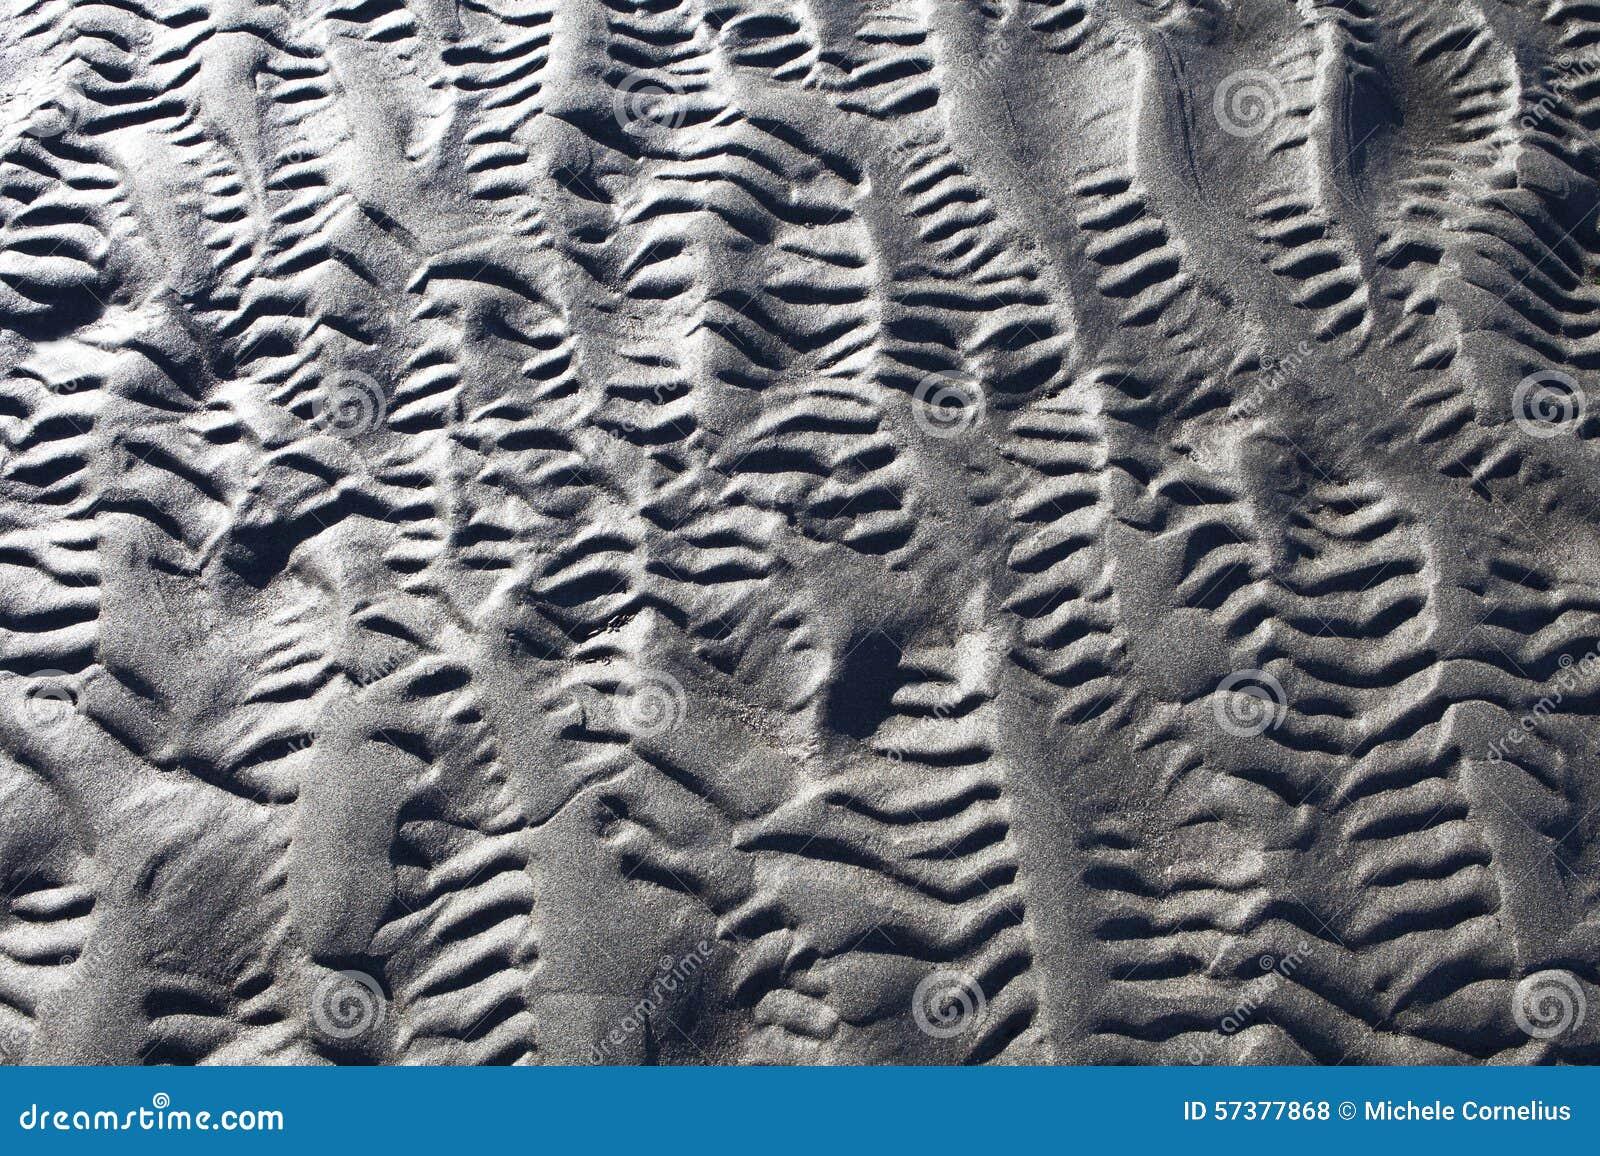 Zandpatronen